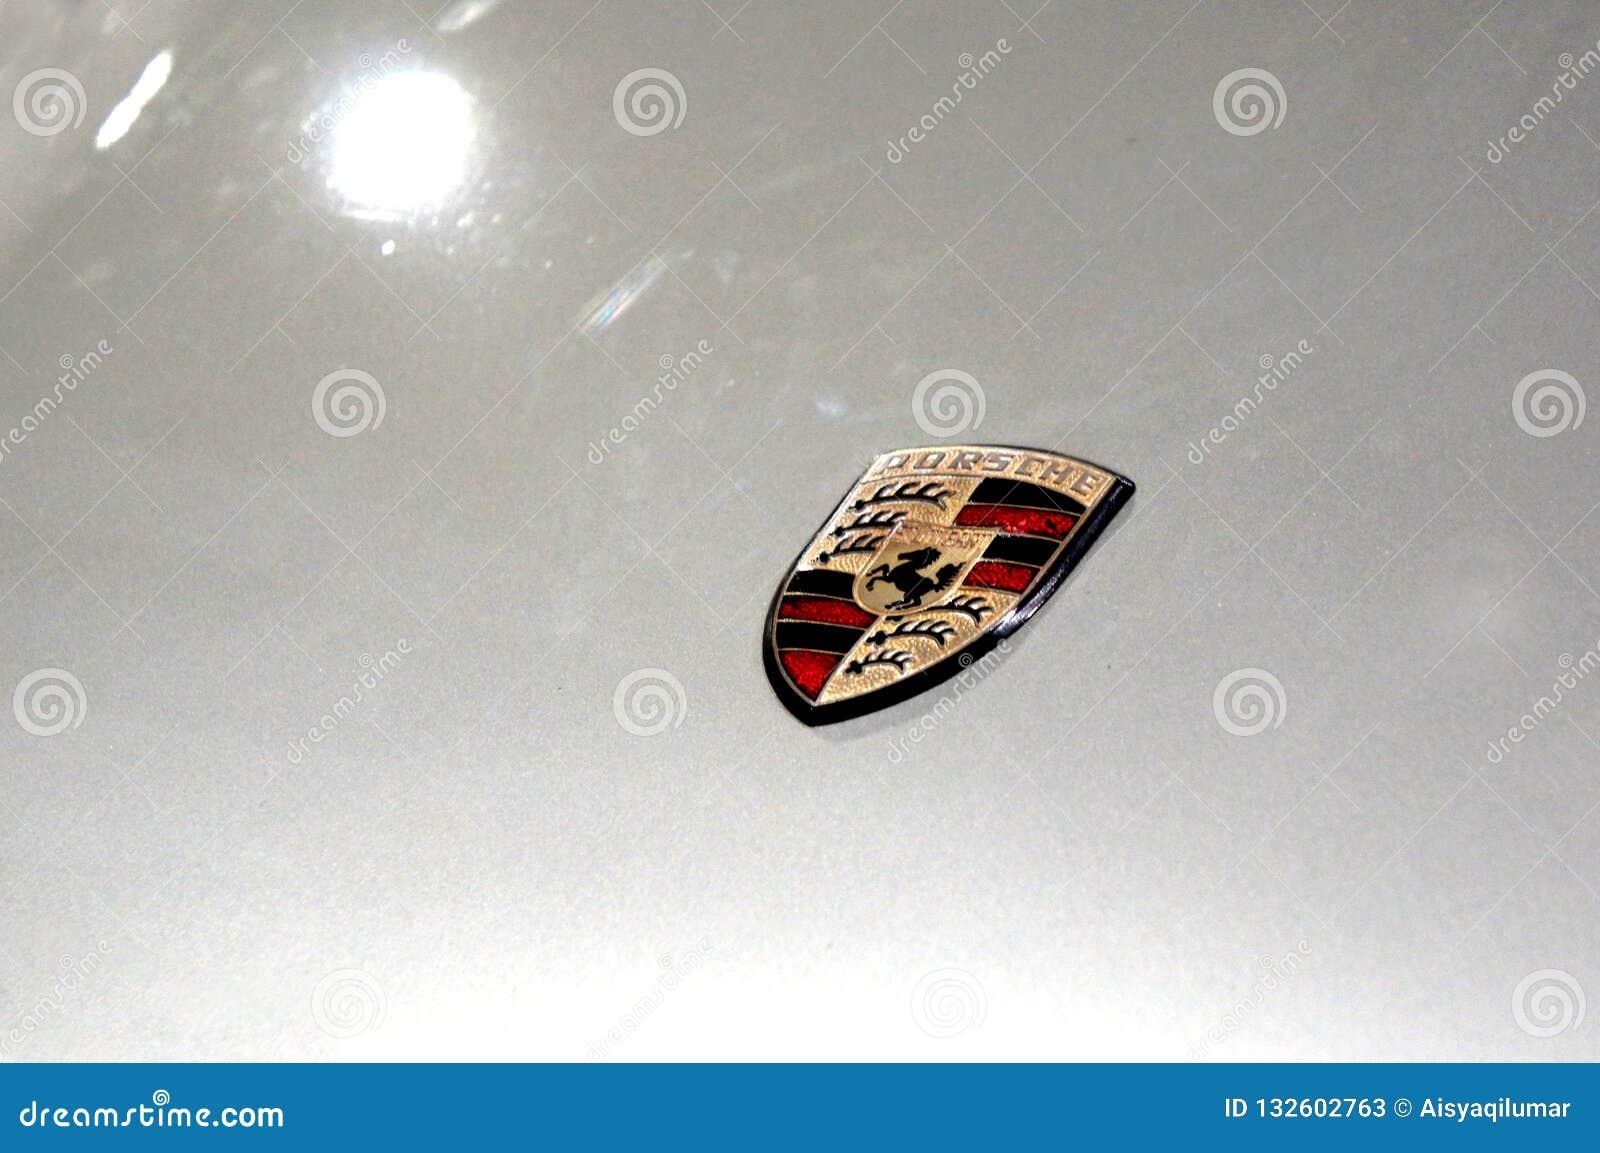 Porsche Car Logos And Emblem At The Car Body Editorial Stock Photo Image Of Editorial German 132602763